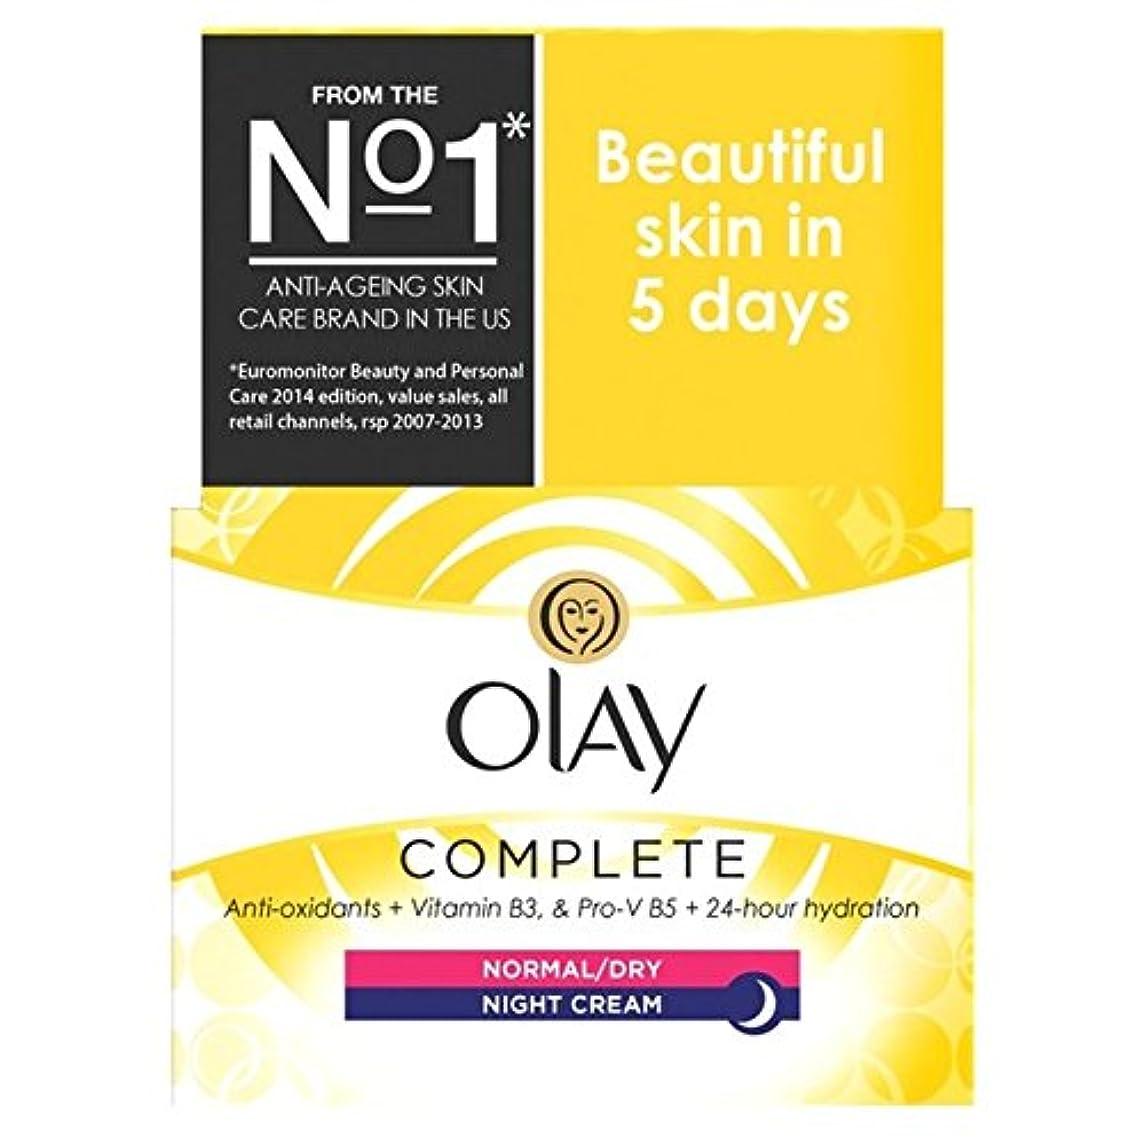 Olay Essentials Complete Care Moisturiser Night Cream 50ml - オーレイ必需品の完全なケア保湿ナイトクリーム50ミリリットル [並行輸入品]